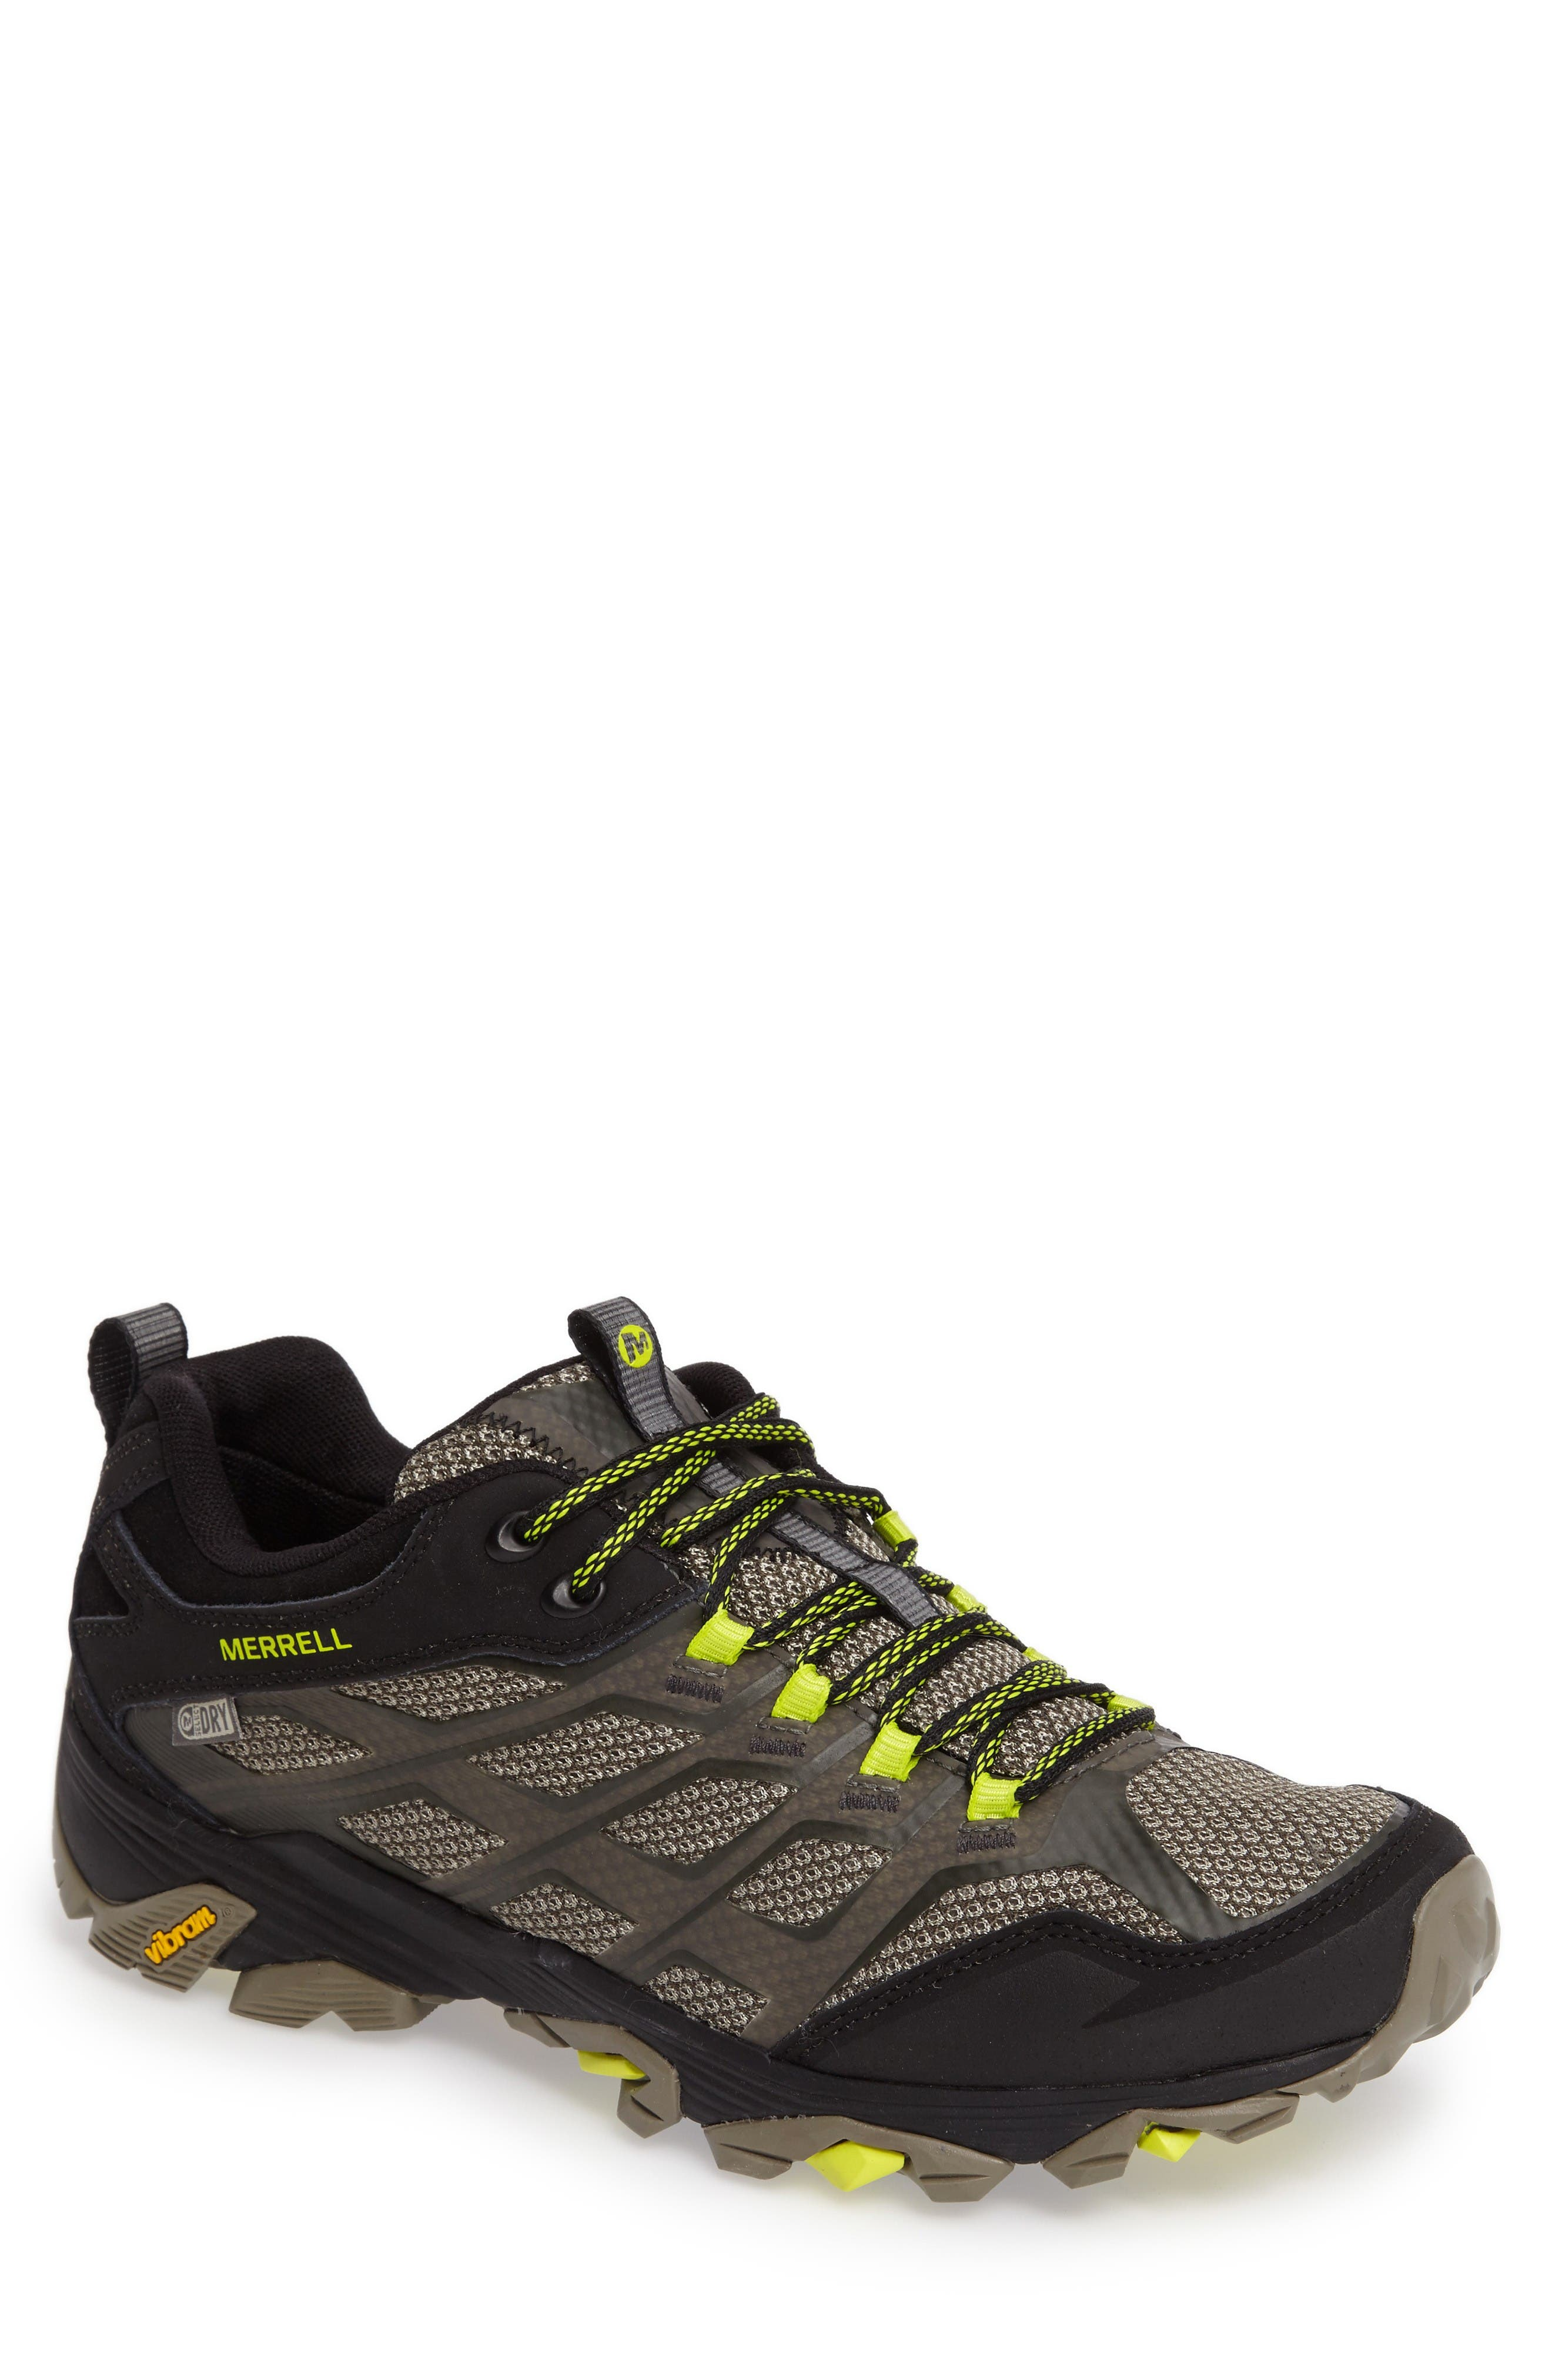 Alternate Image 1 Selected - Merrell Moab FST Waterproof Hiking Shoe (Men)